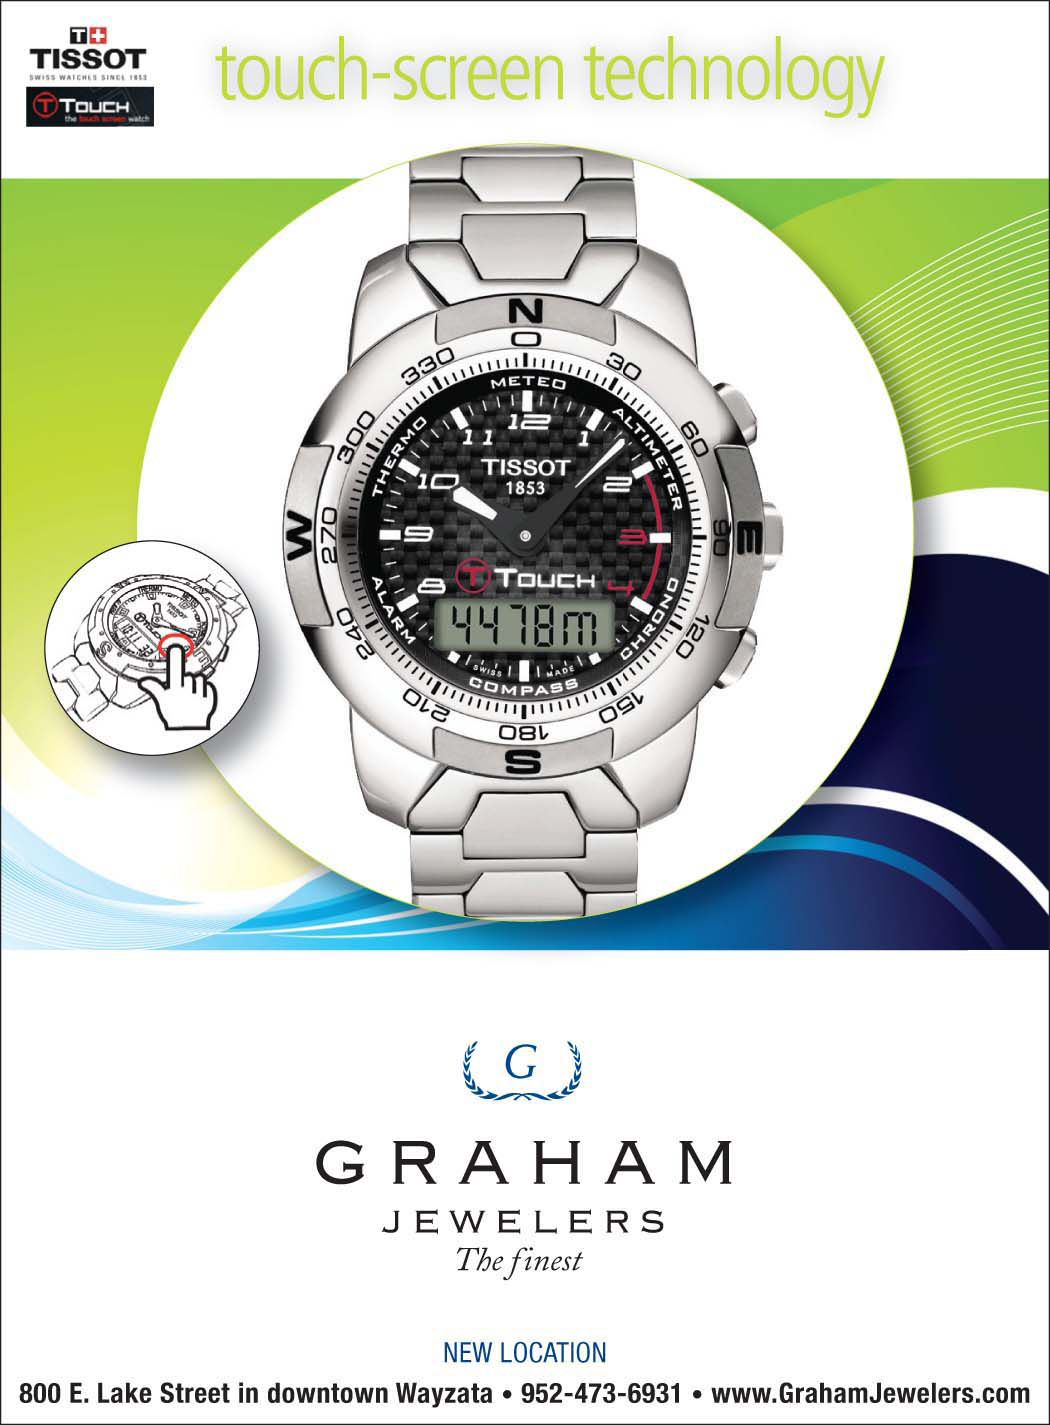 Graham Jewelers Tissot Ad.jpg